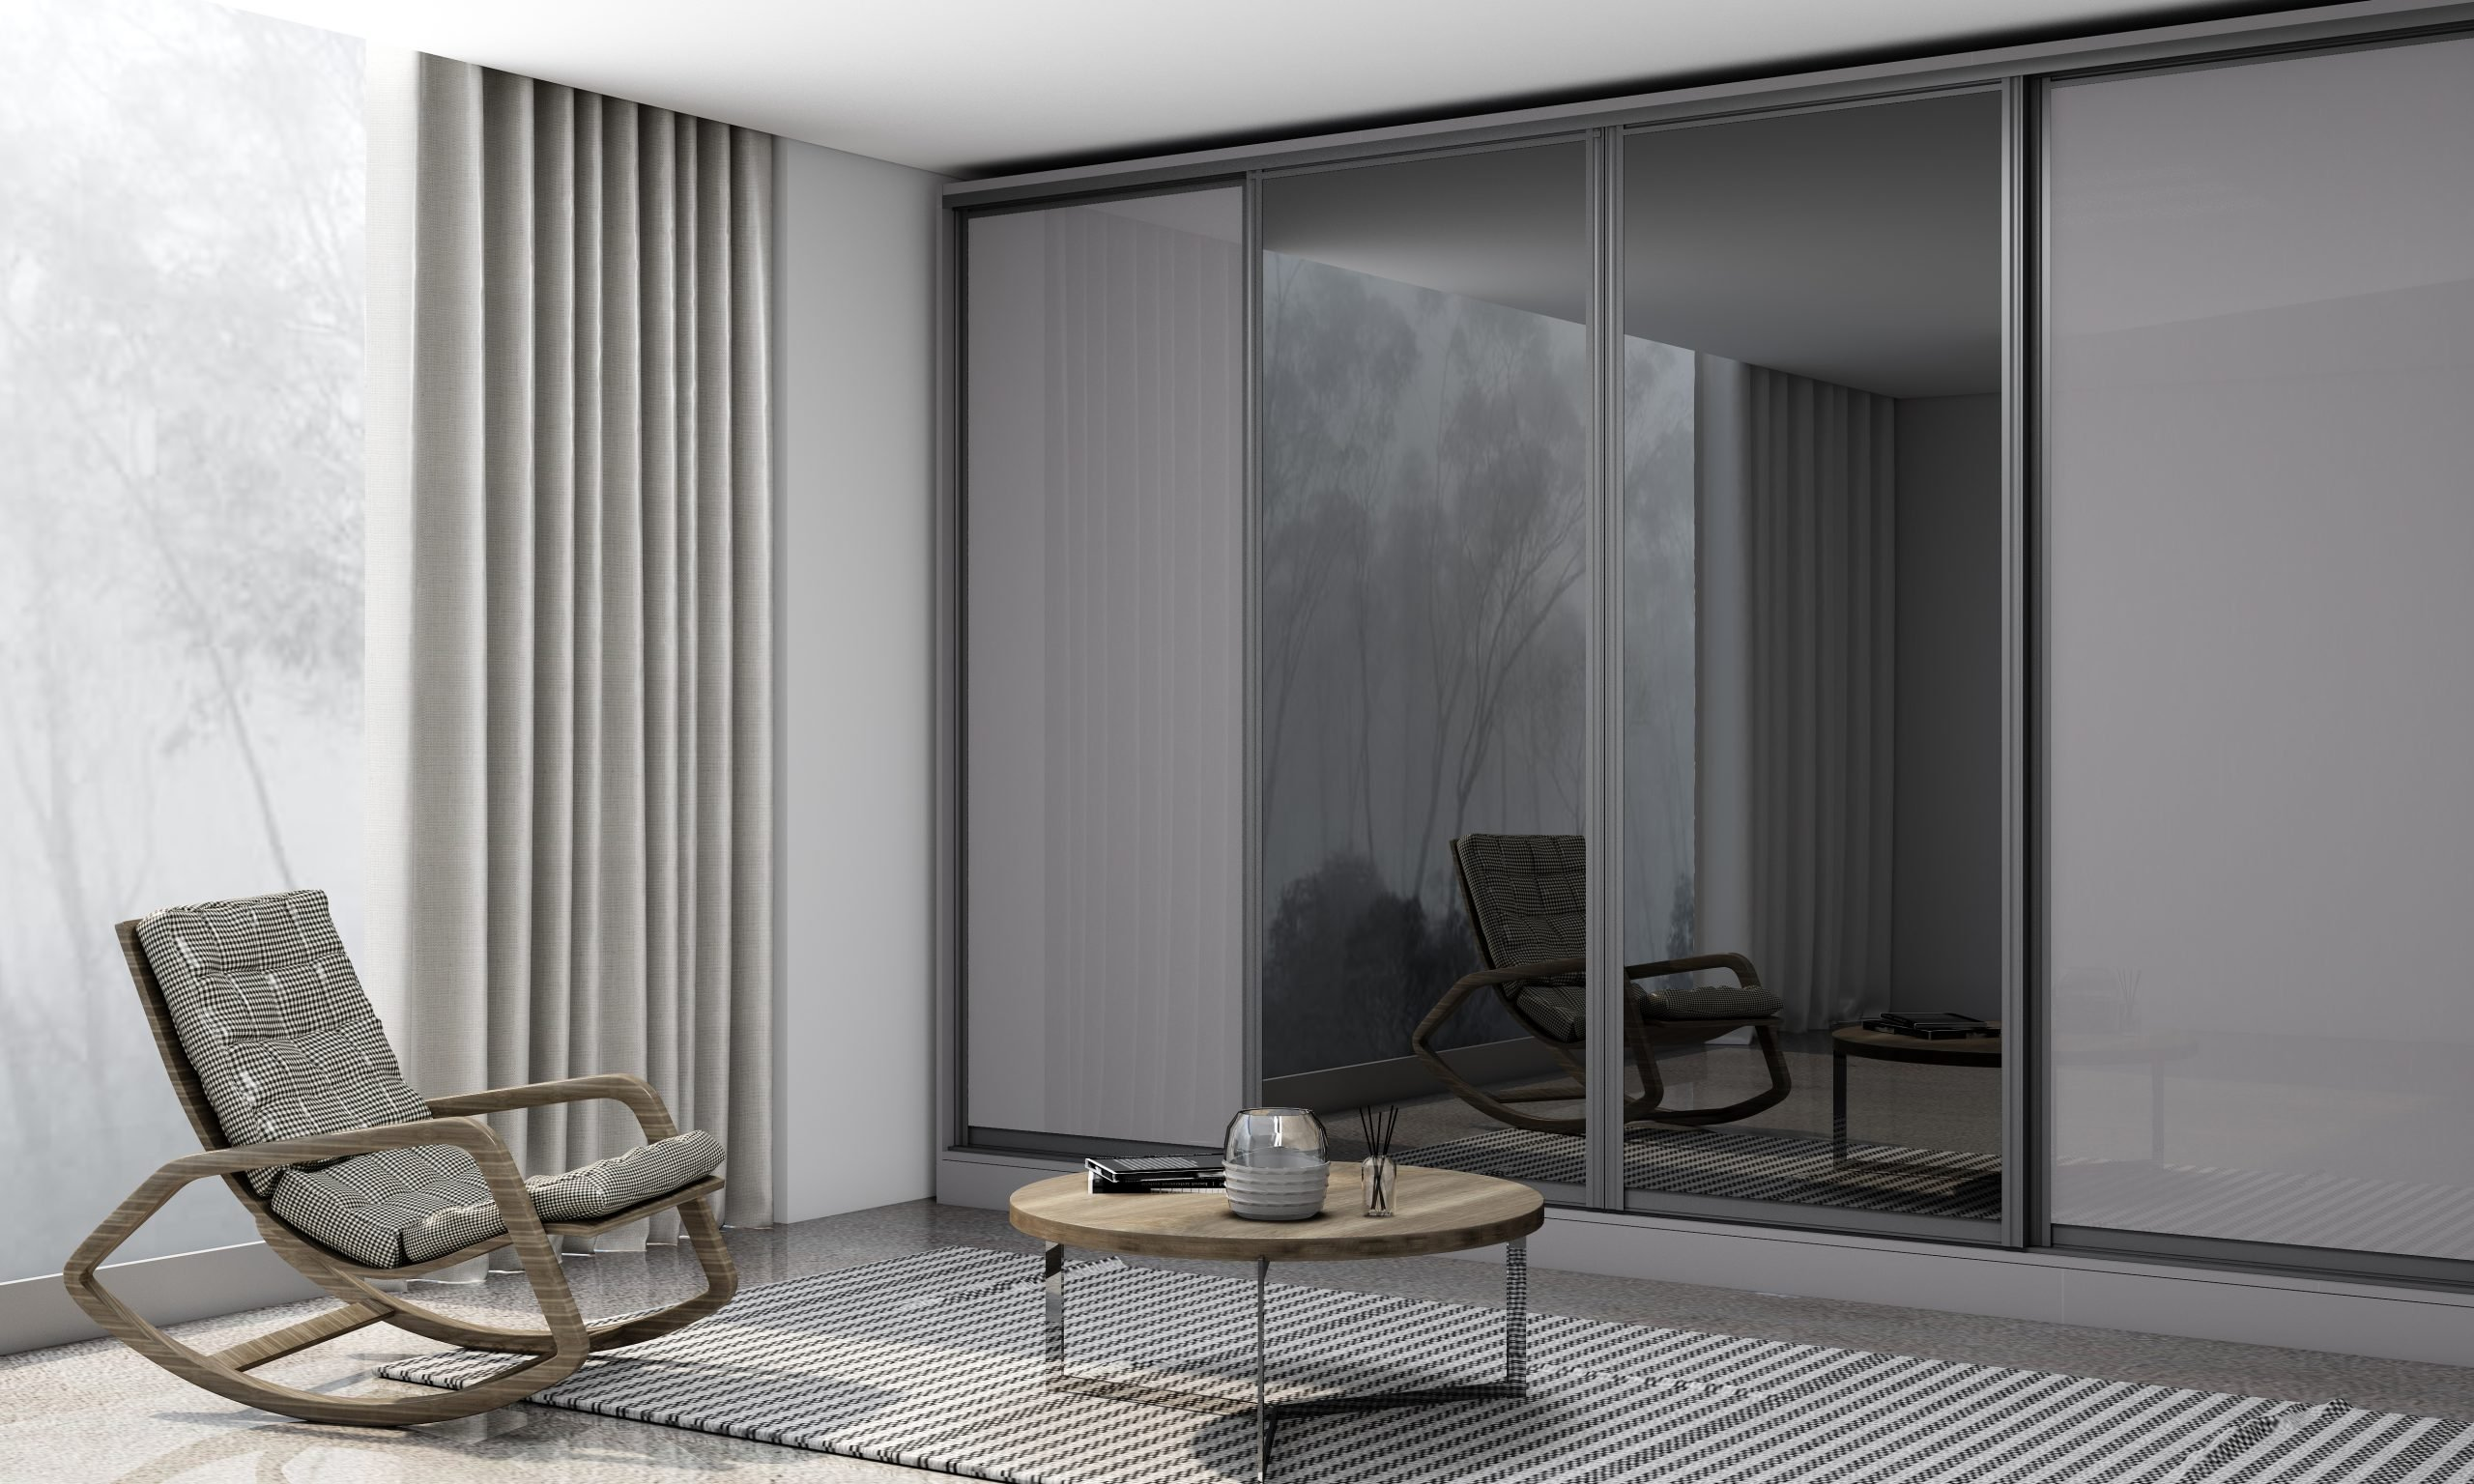 Bespoke Wooden Sliding Wardrobe in Gloss Grey Finish With Full Grey Tinted Mirror